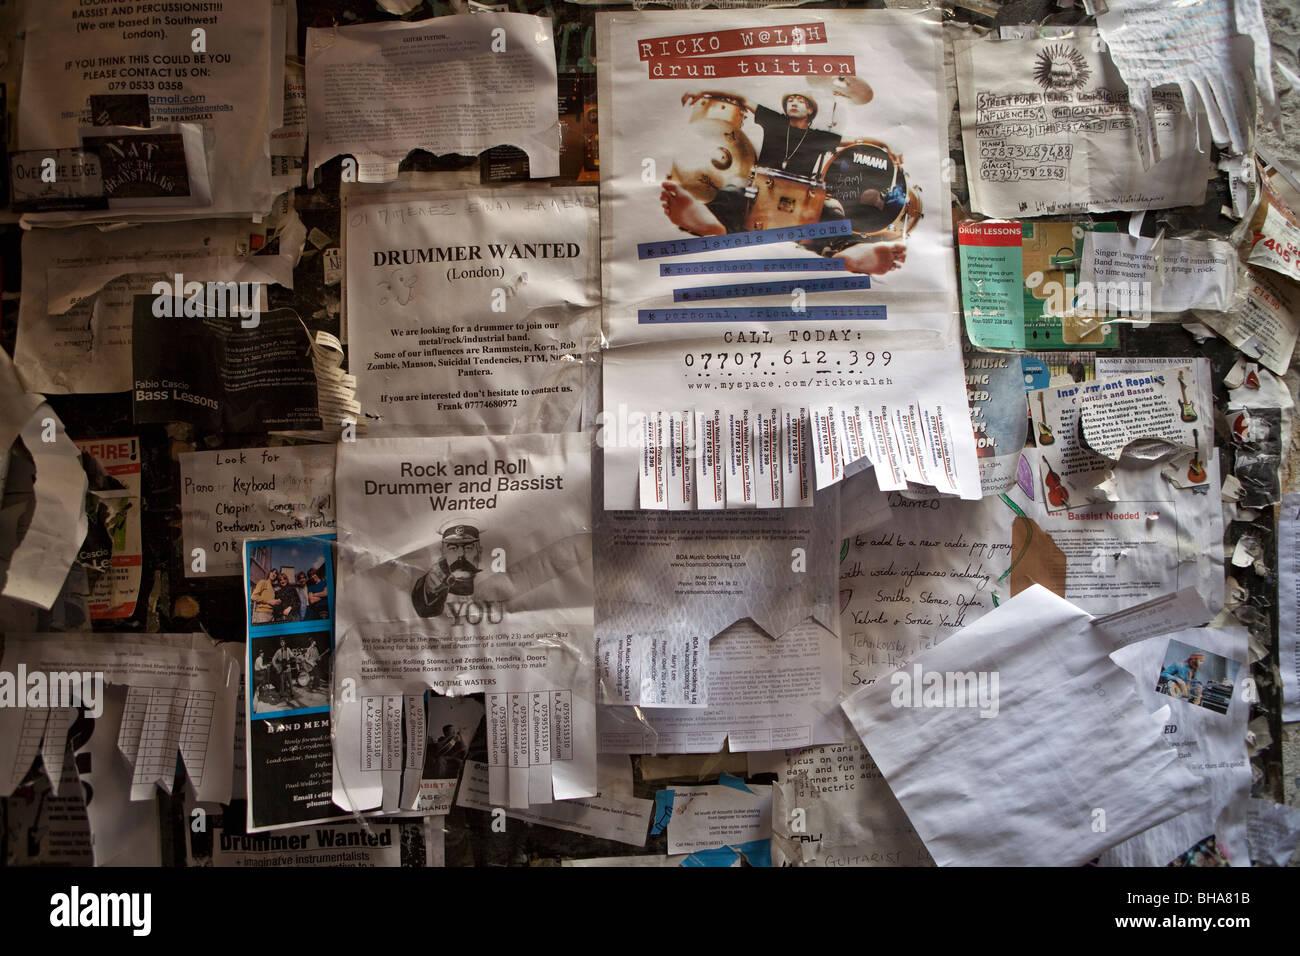 Noticeboard advertising for musicians, Denmark Street, London - Stock Image